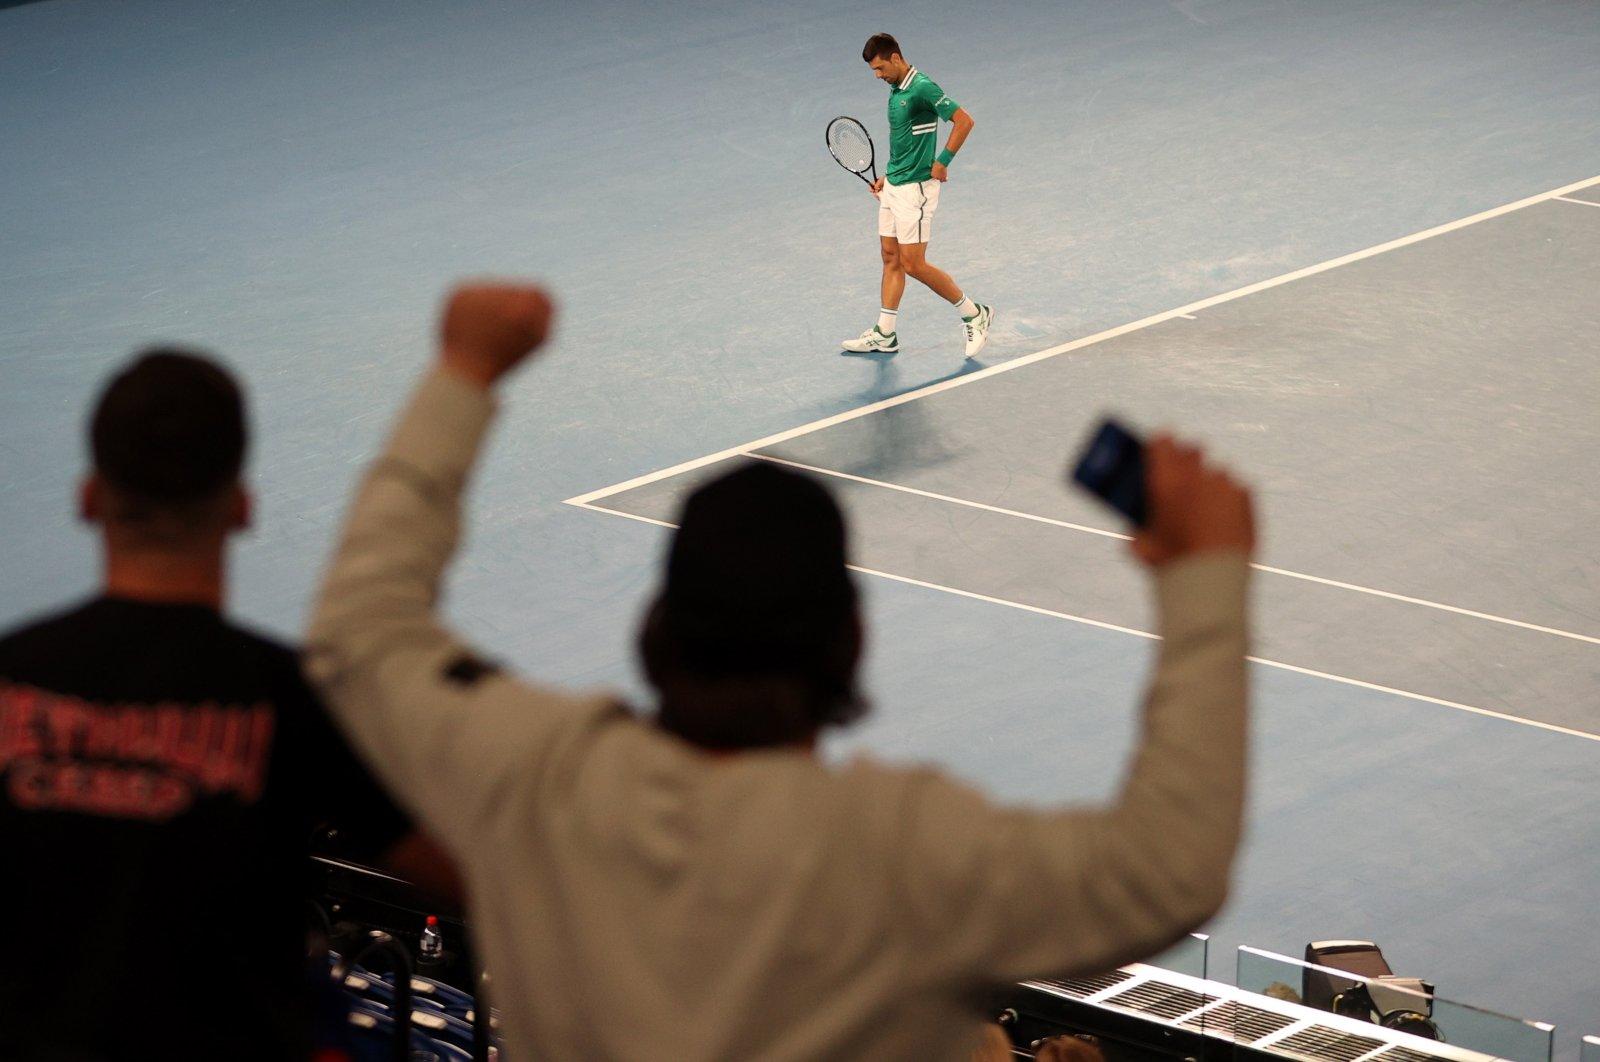 Fans react during an Australian Open tennis match between Novak Djokovic and Taylor Fritz, in Melbourne, Australia, Feb. 12, 2021. (Reuters Photo)